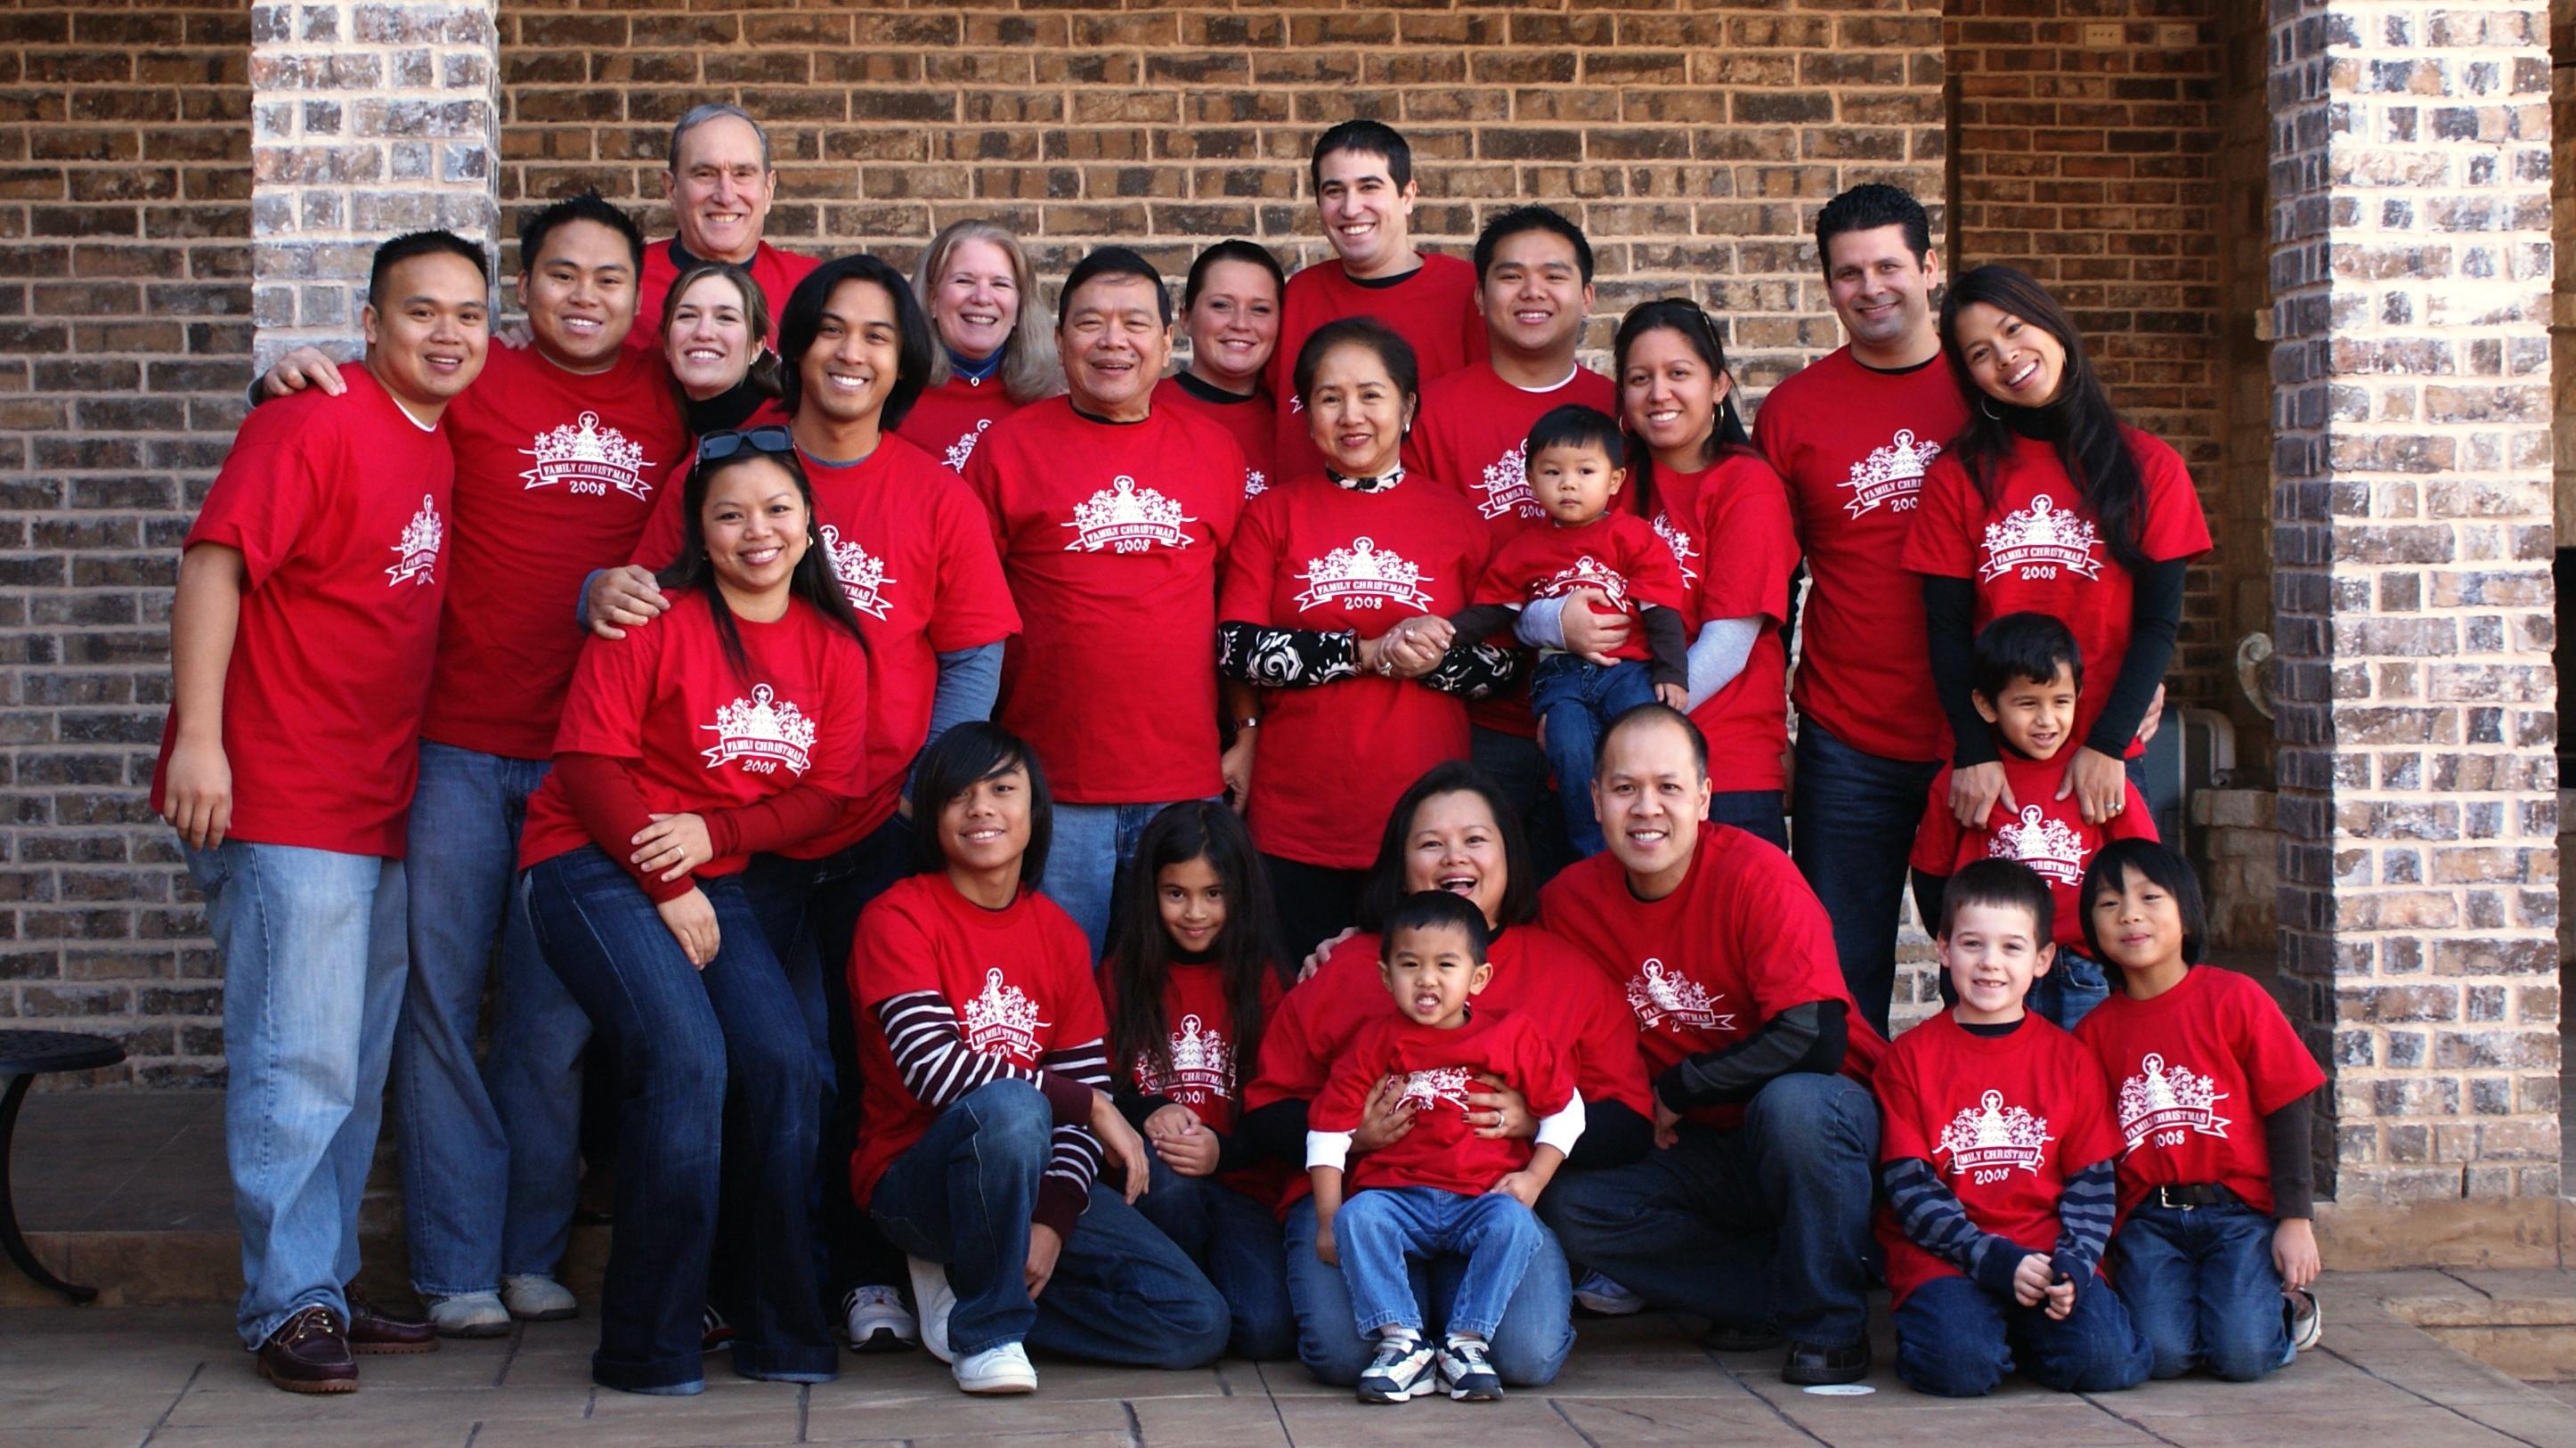 Custom T-Shirts for Family Gathering - Shirt Design Ideas